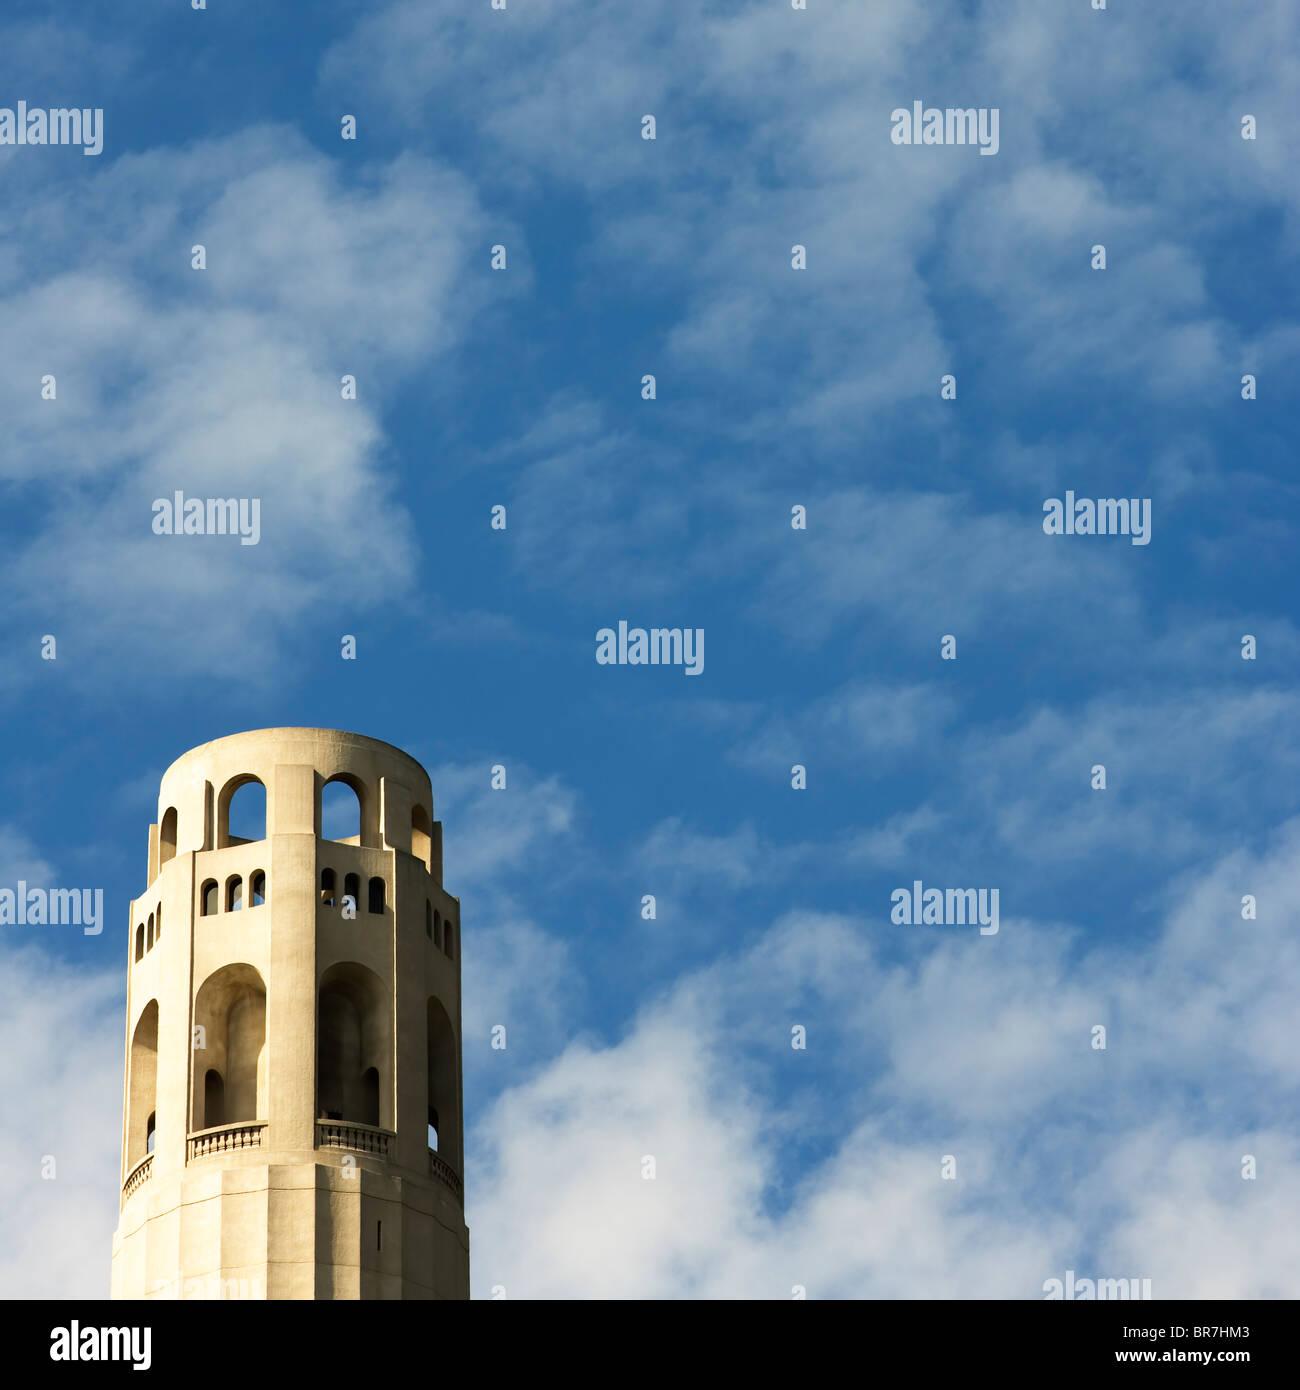 Coit Tower San Francisco CA. against blue cloudy sky. Stock Photo